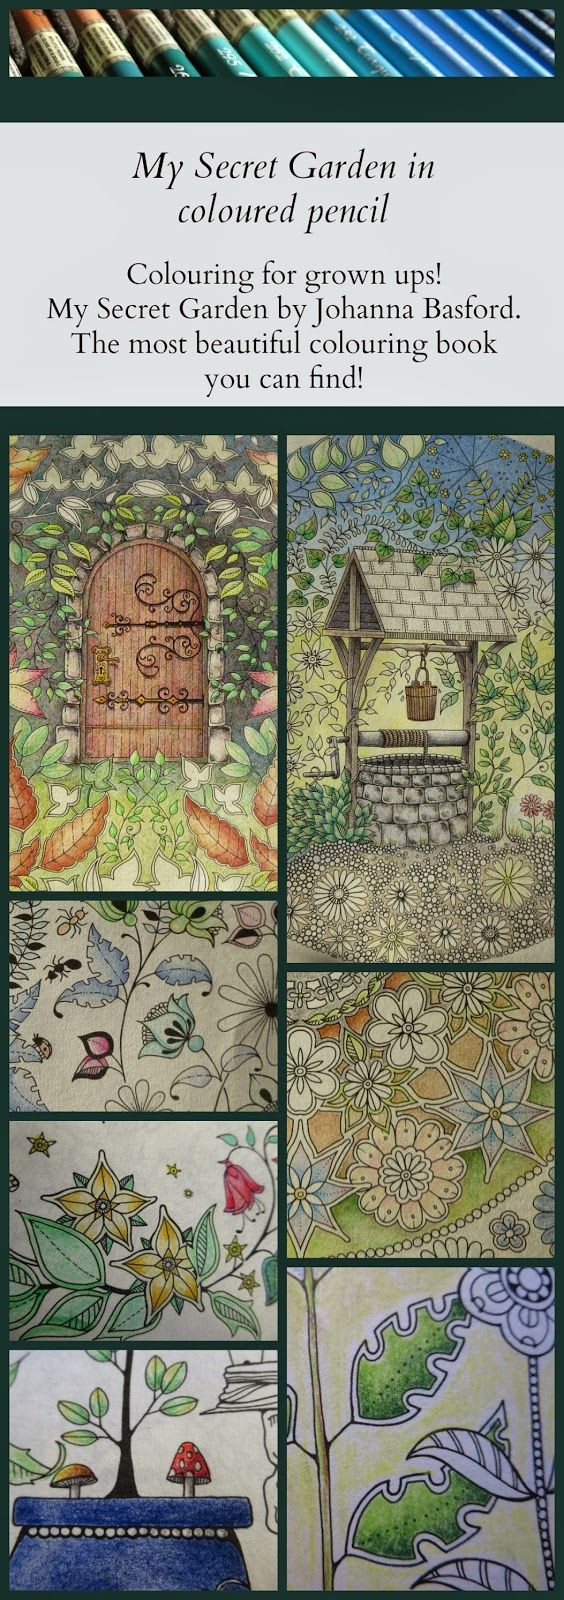 Passion for Pencils: My Secret Garden colouring book, part 3